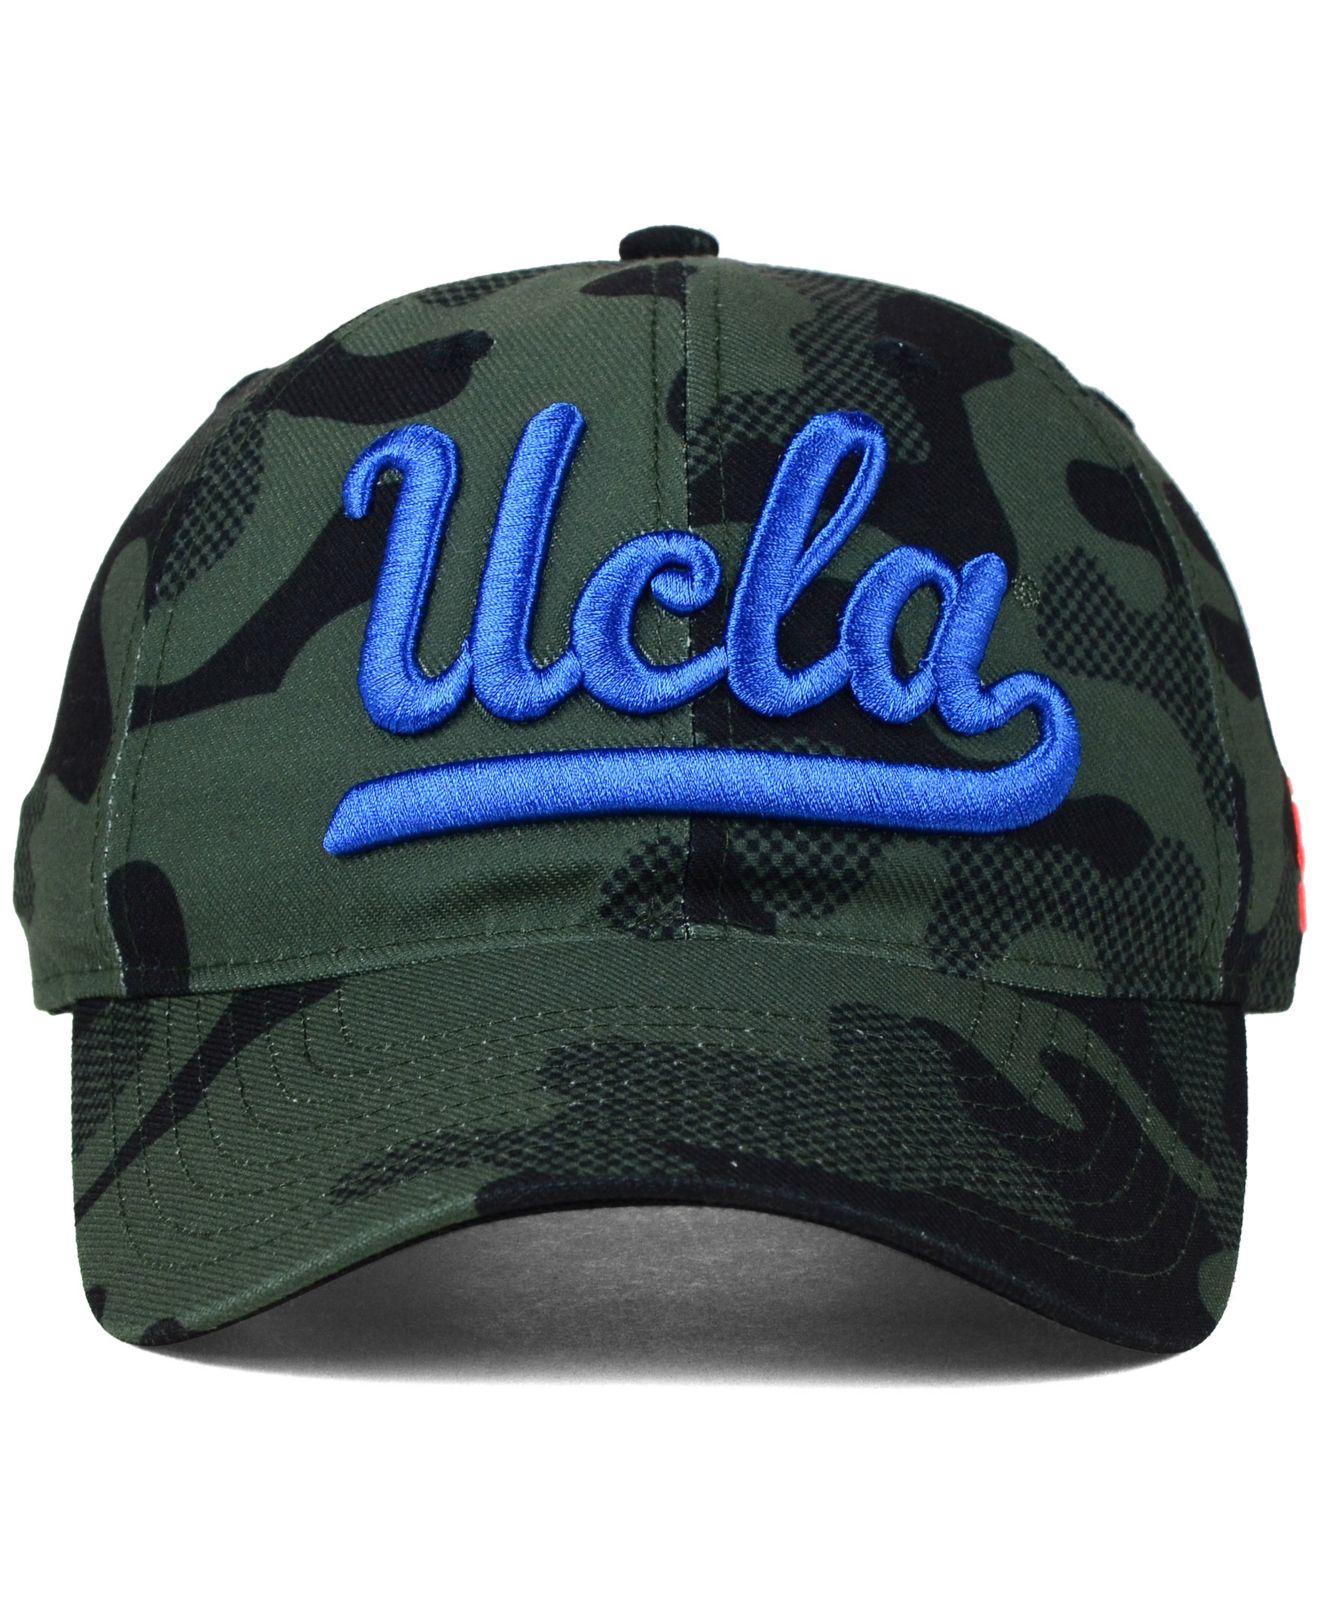 9602b1d3c9f63 ... uk lyst adidas ucla bruins veterans day camo slouch adjustable cap in  027c1 16d94